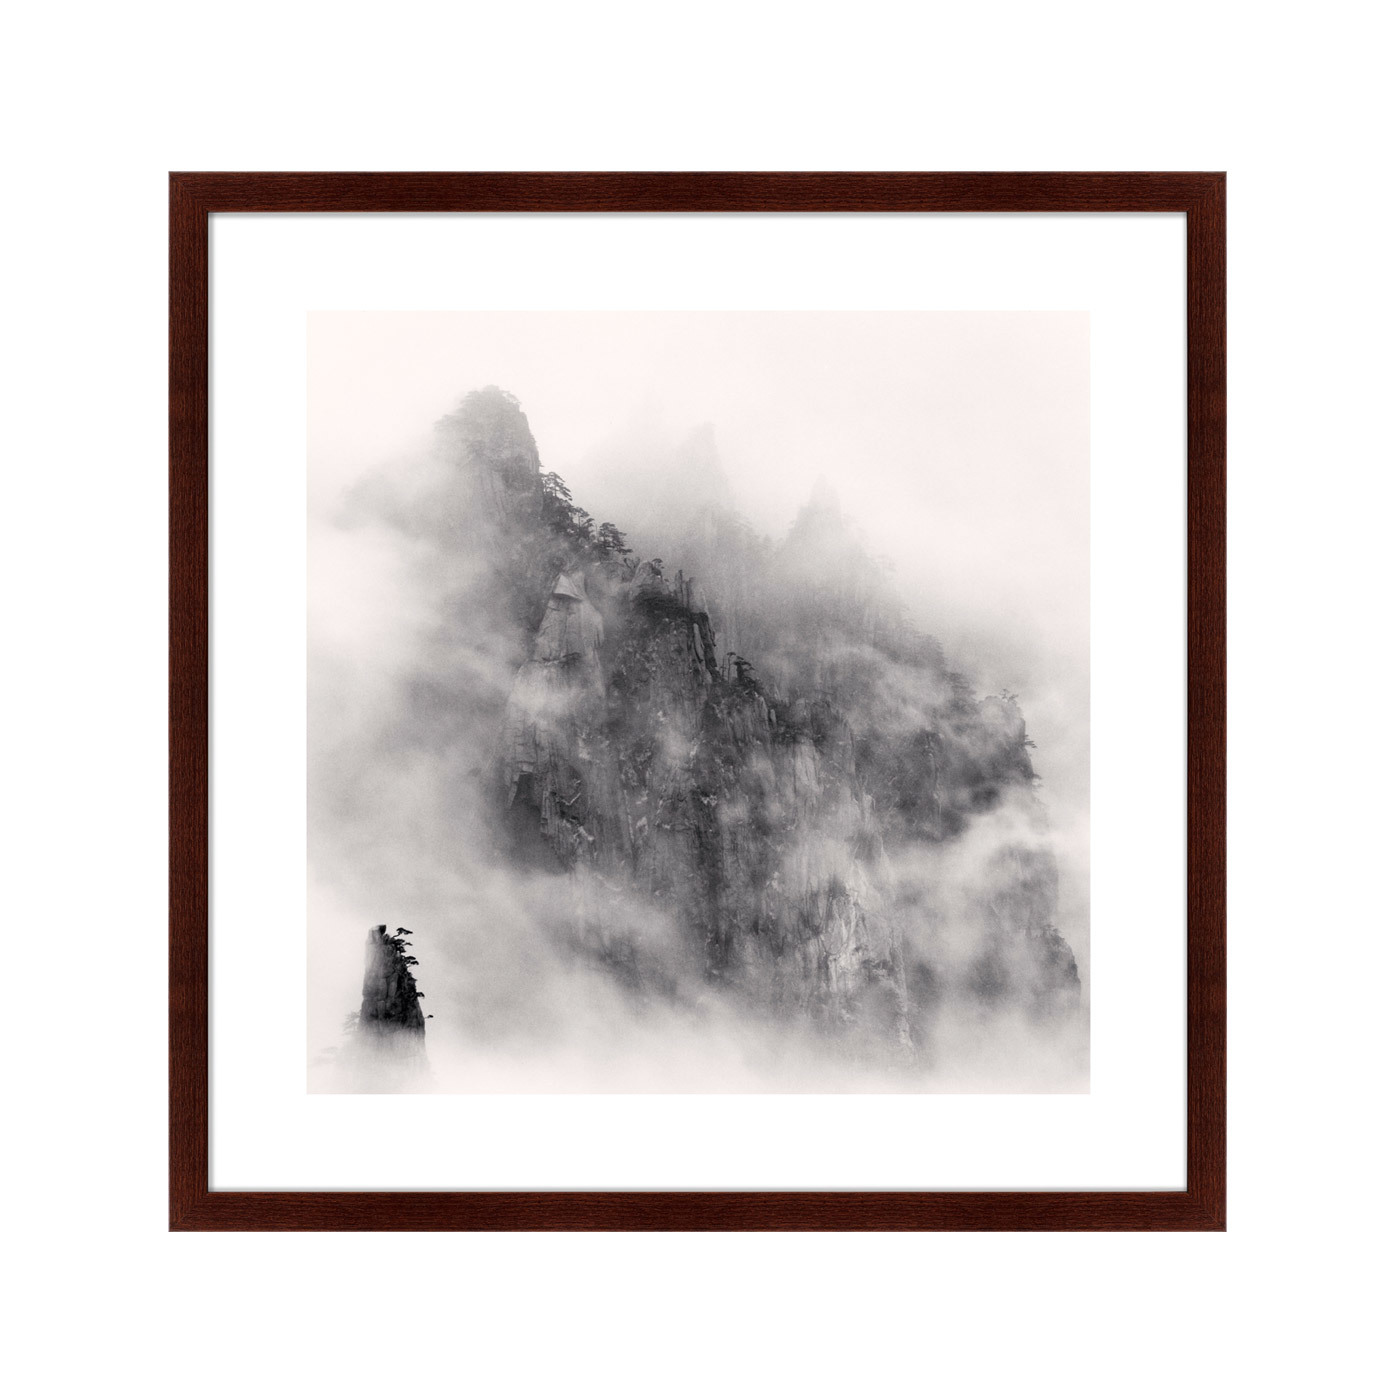 {} Картины в Квартиру Картина Huangshan Mountains (79х79 см) картины в квартиру картина etude 3 102х130 см